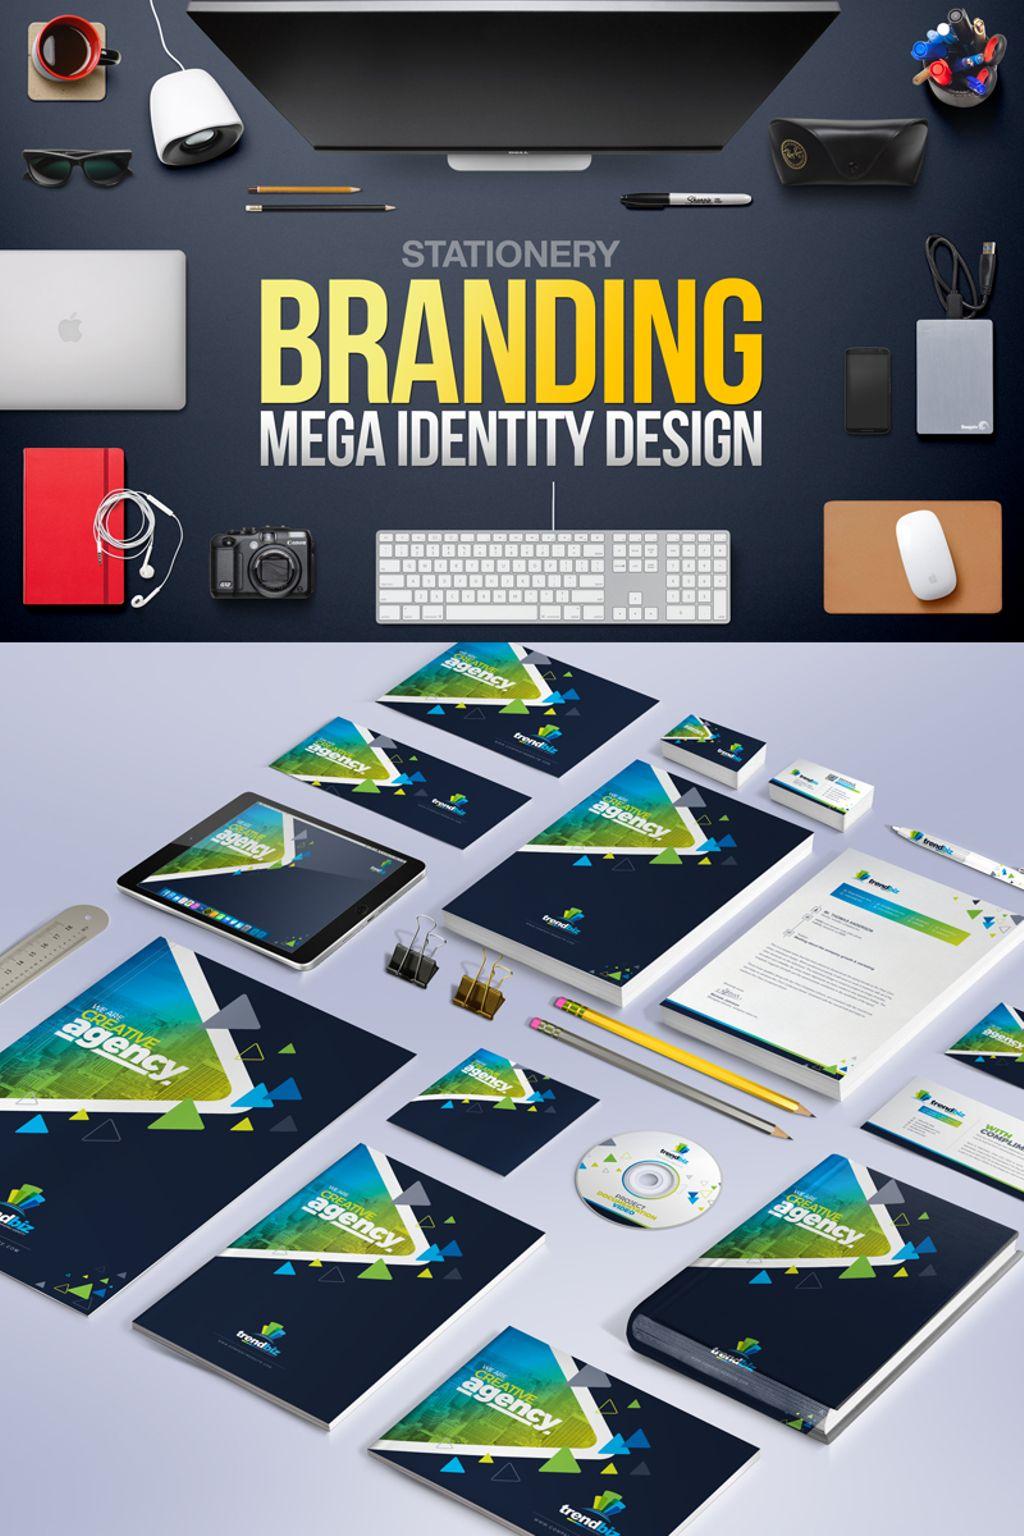 Stationery Branding Mega Identity Design Márkastílus sablon 67294